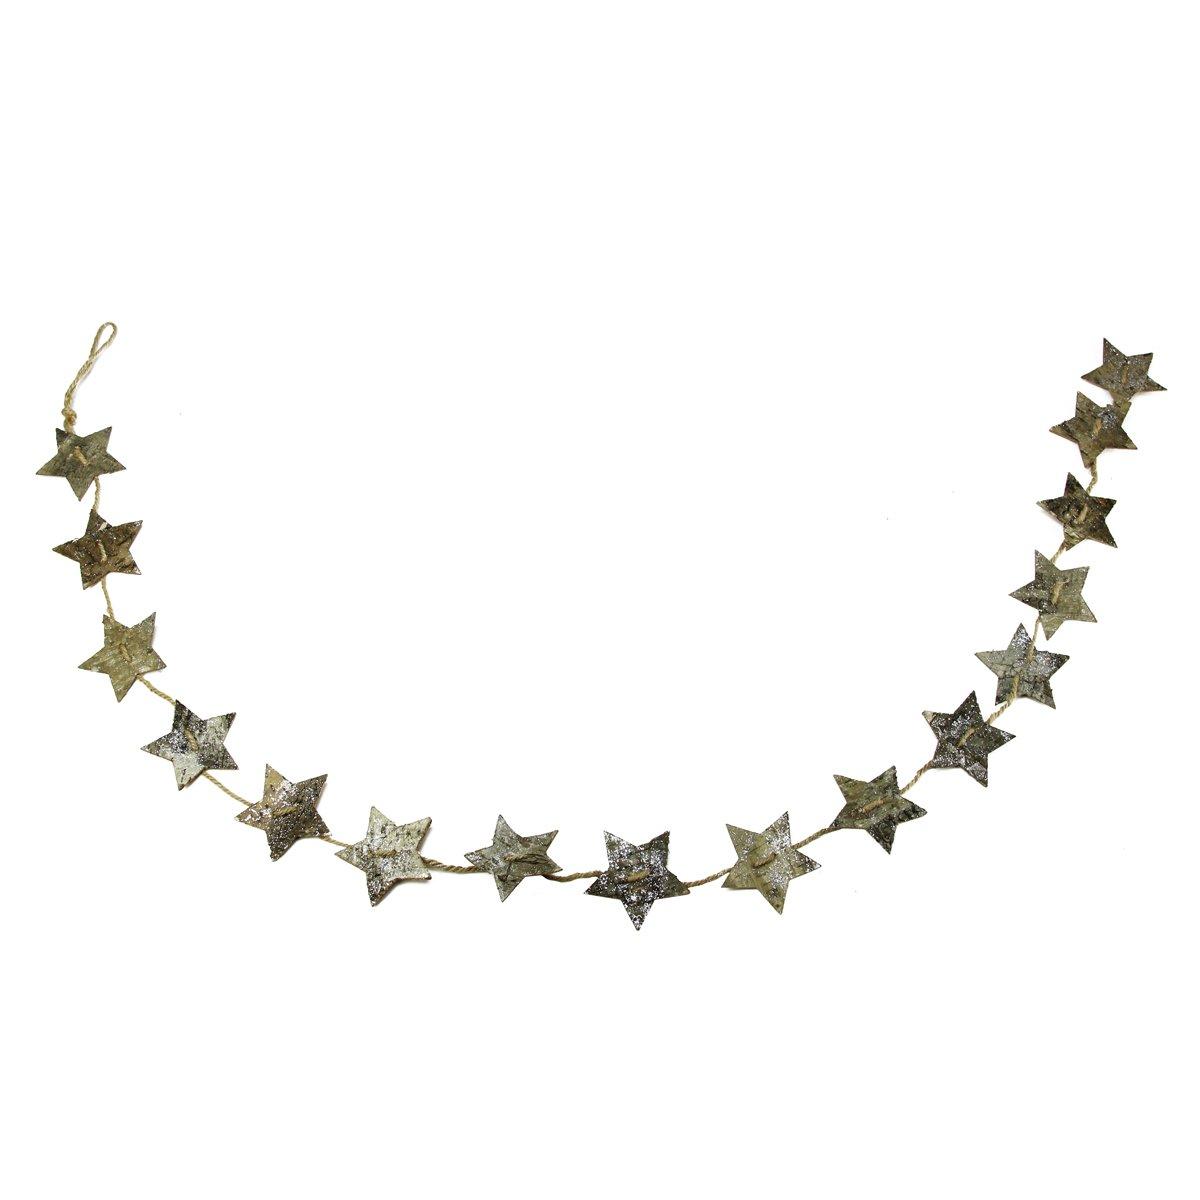 Unlit GALLERIE II 60 Brown Glittered Birch Bark Star Novelty Christmas Garland